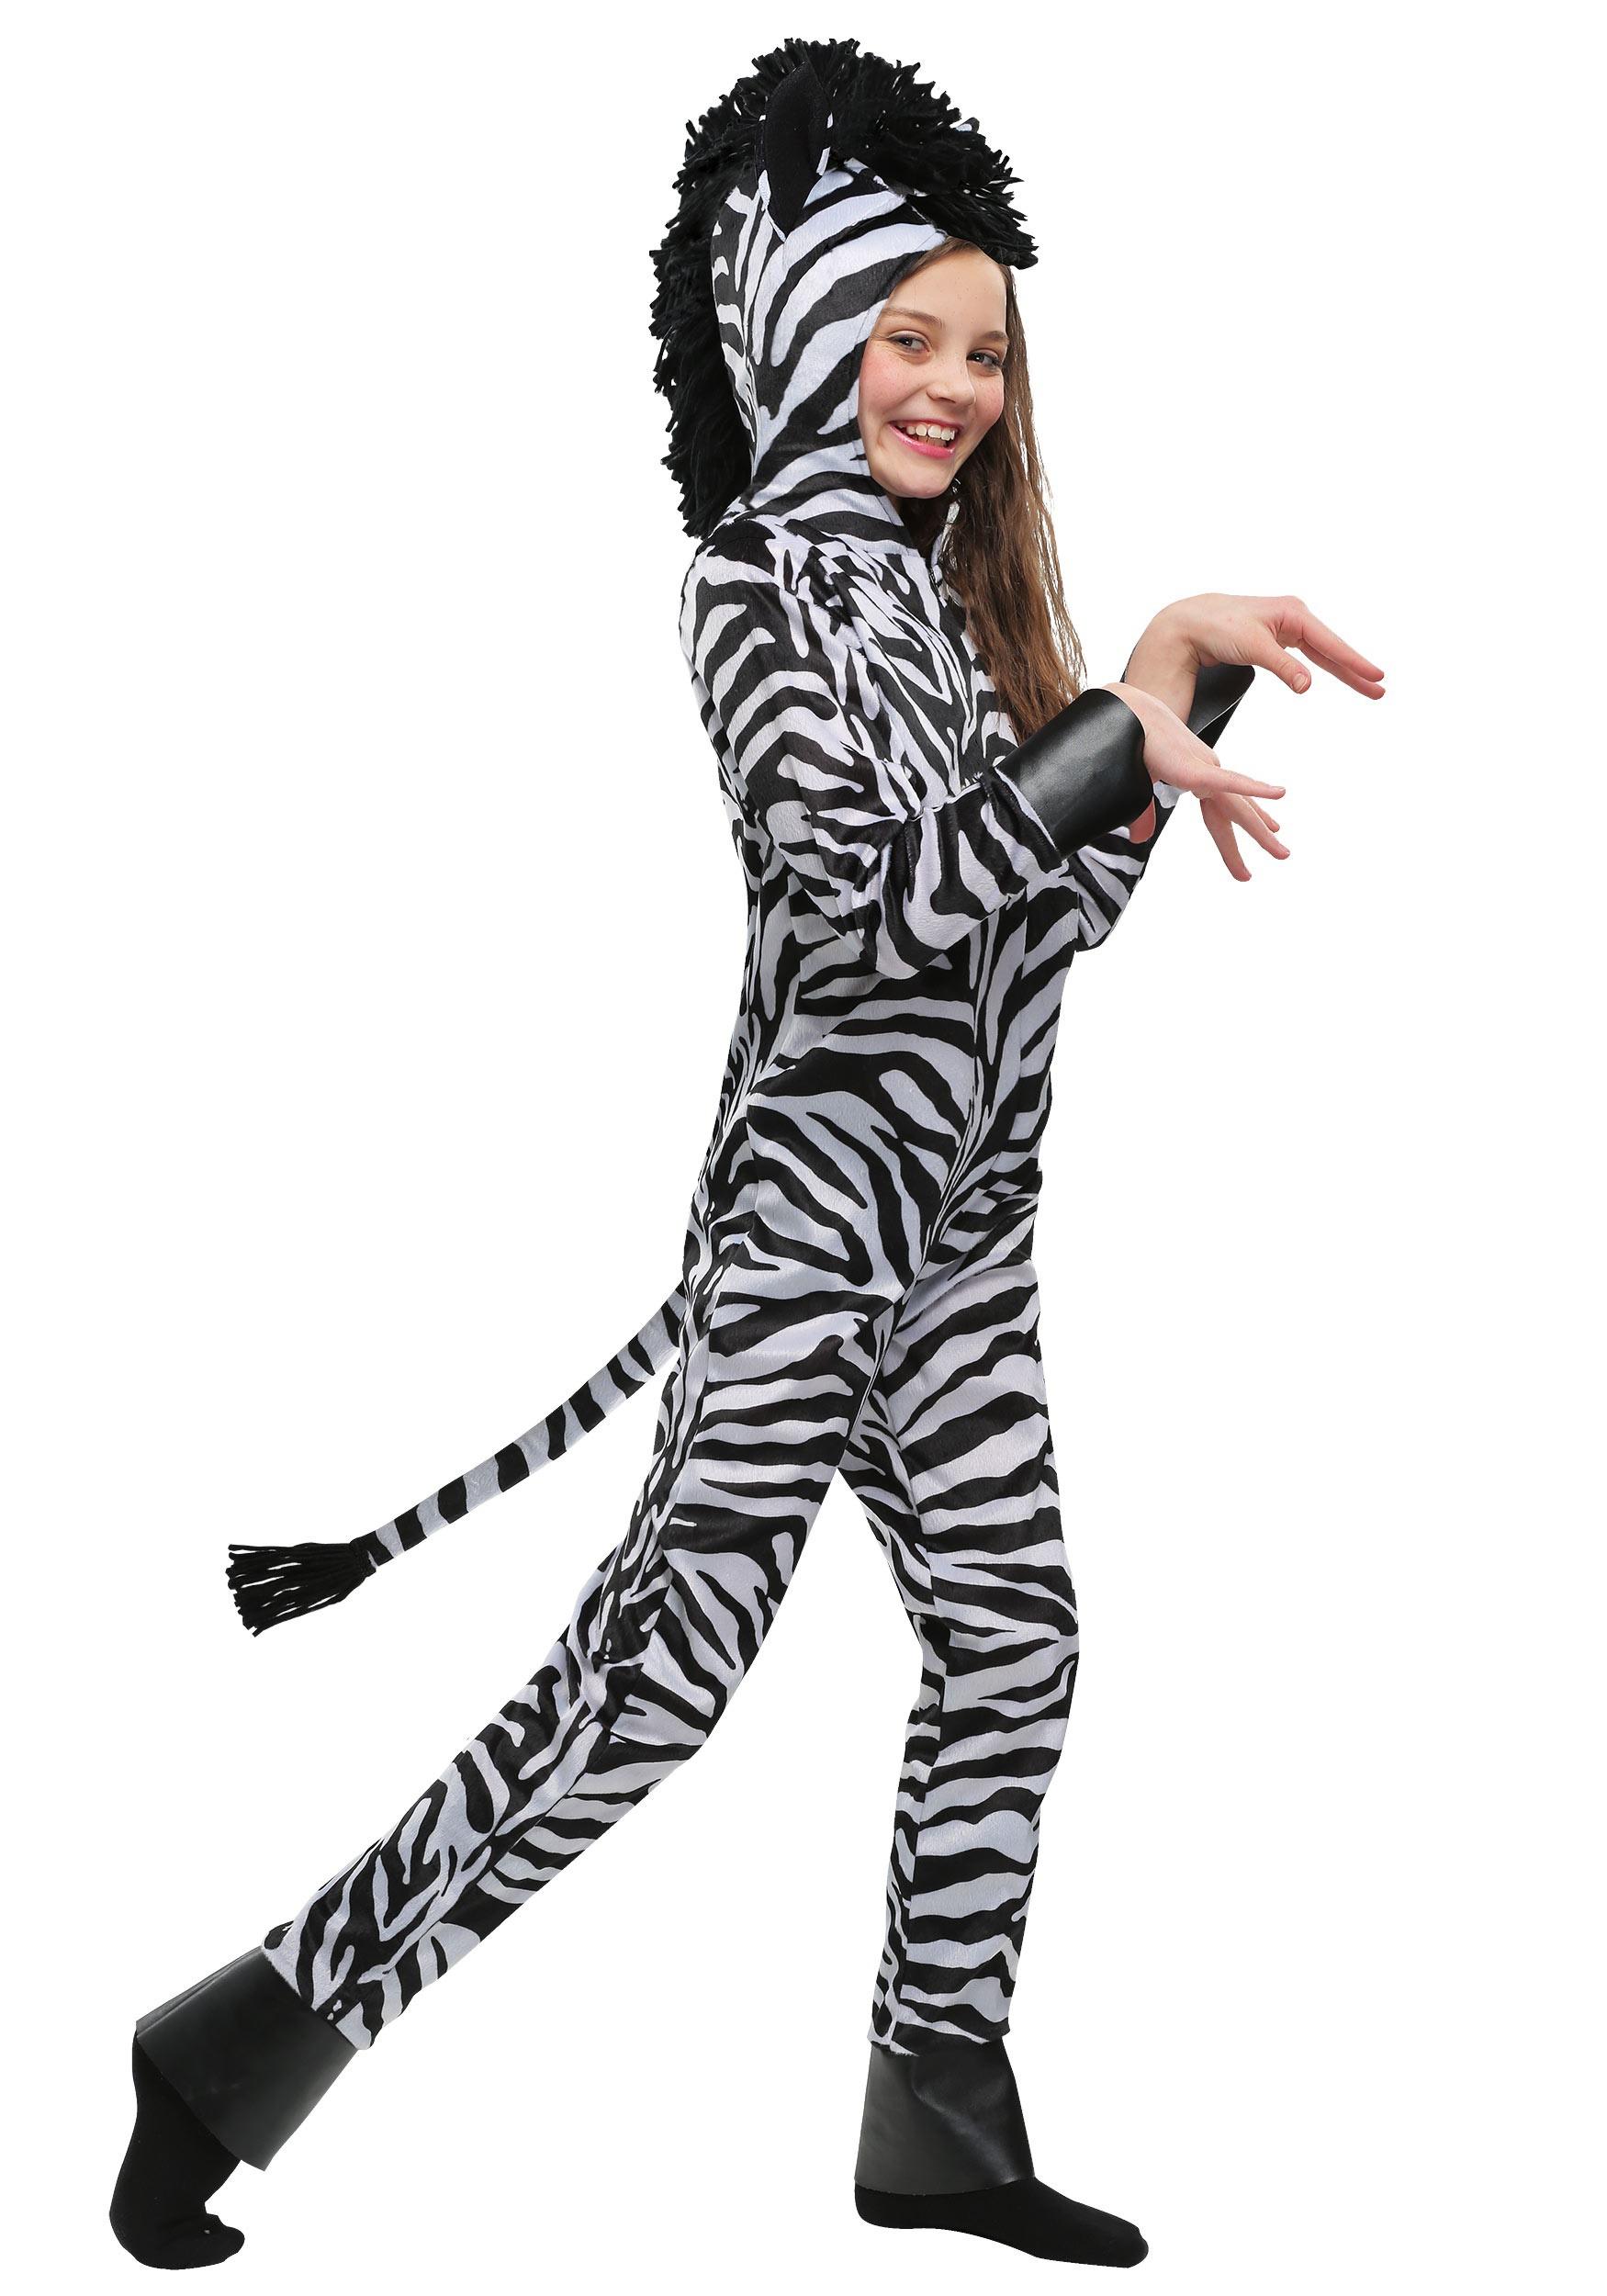 Wild Zebra Kids Costume  sc 1 st  Halloween Costumes & Wild Zebra Costume for Kids